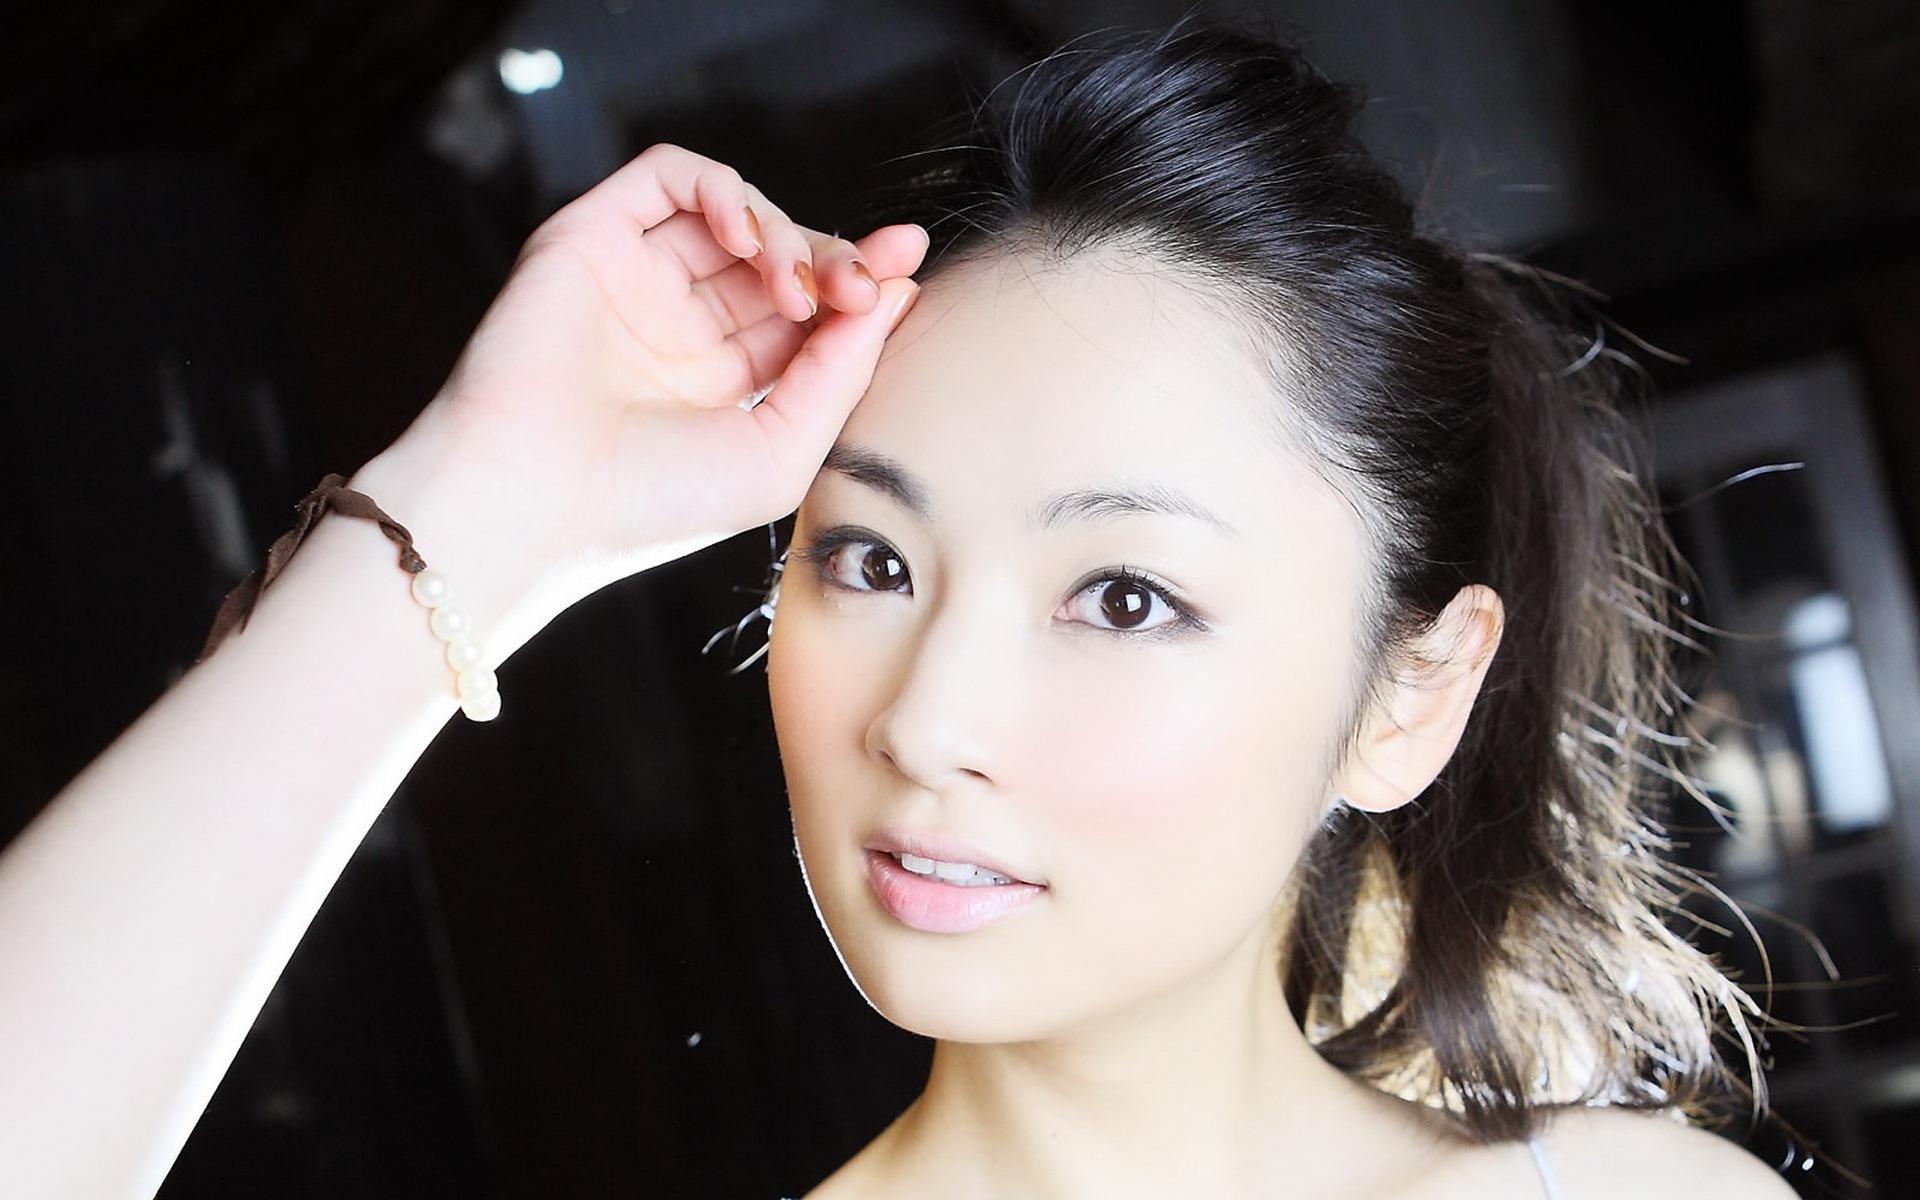 Tantan Hayashi Backgrounds, Compatible - PC, Mobile, Gadgets| 1920x1200 px